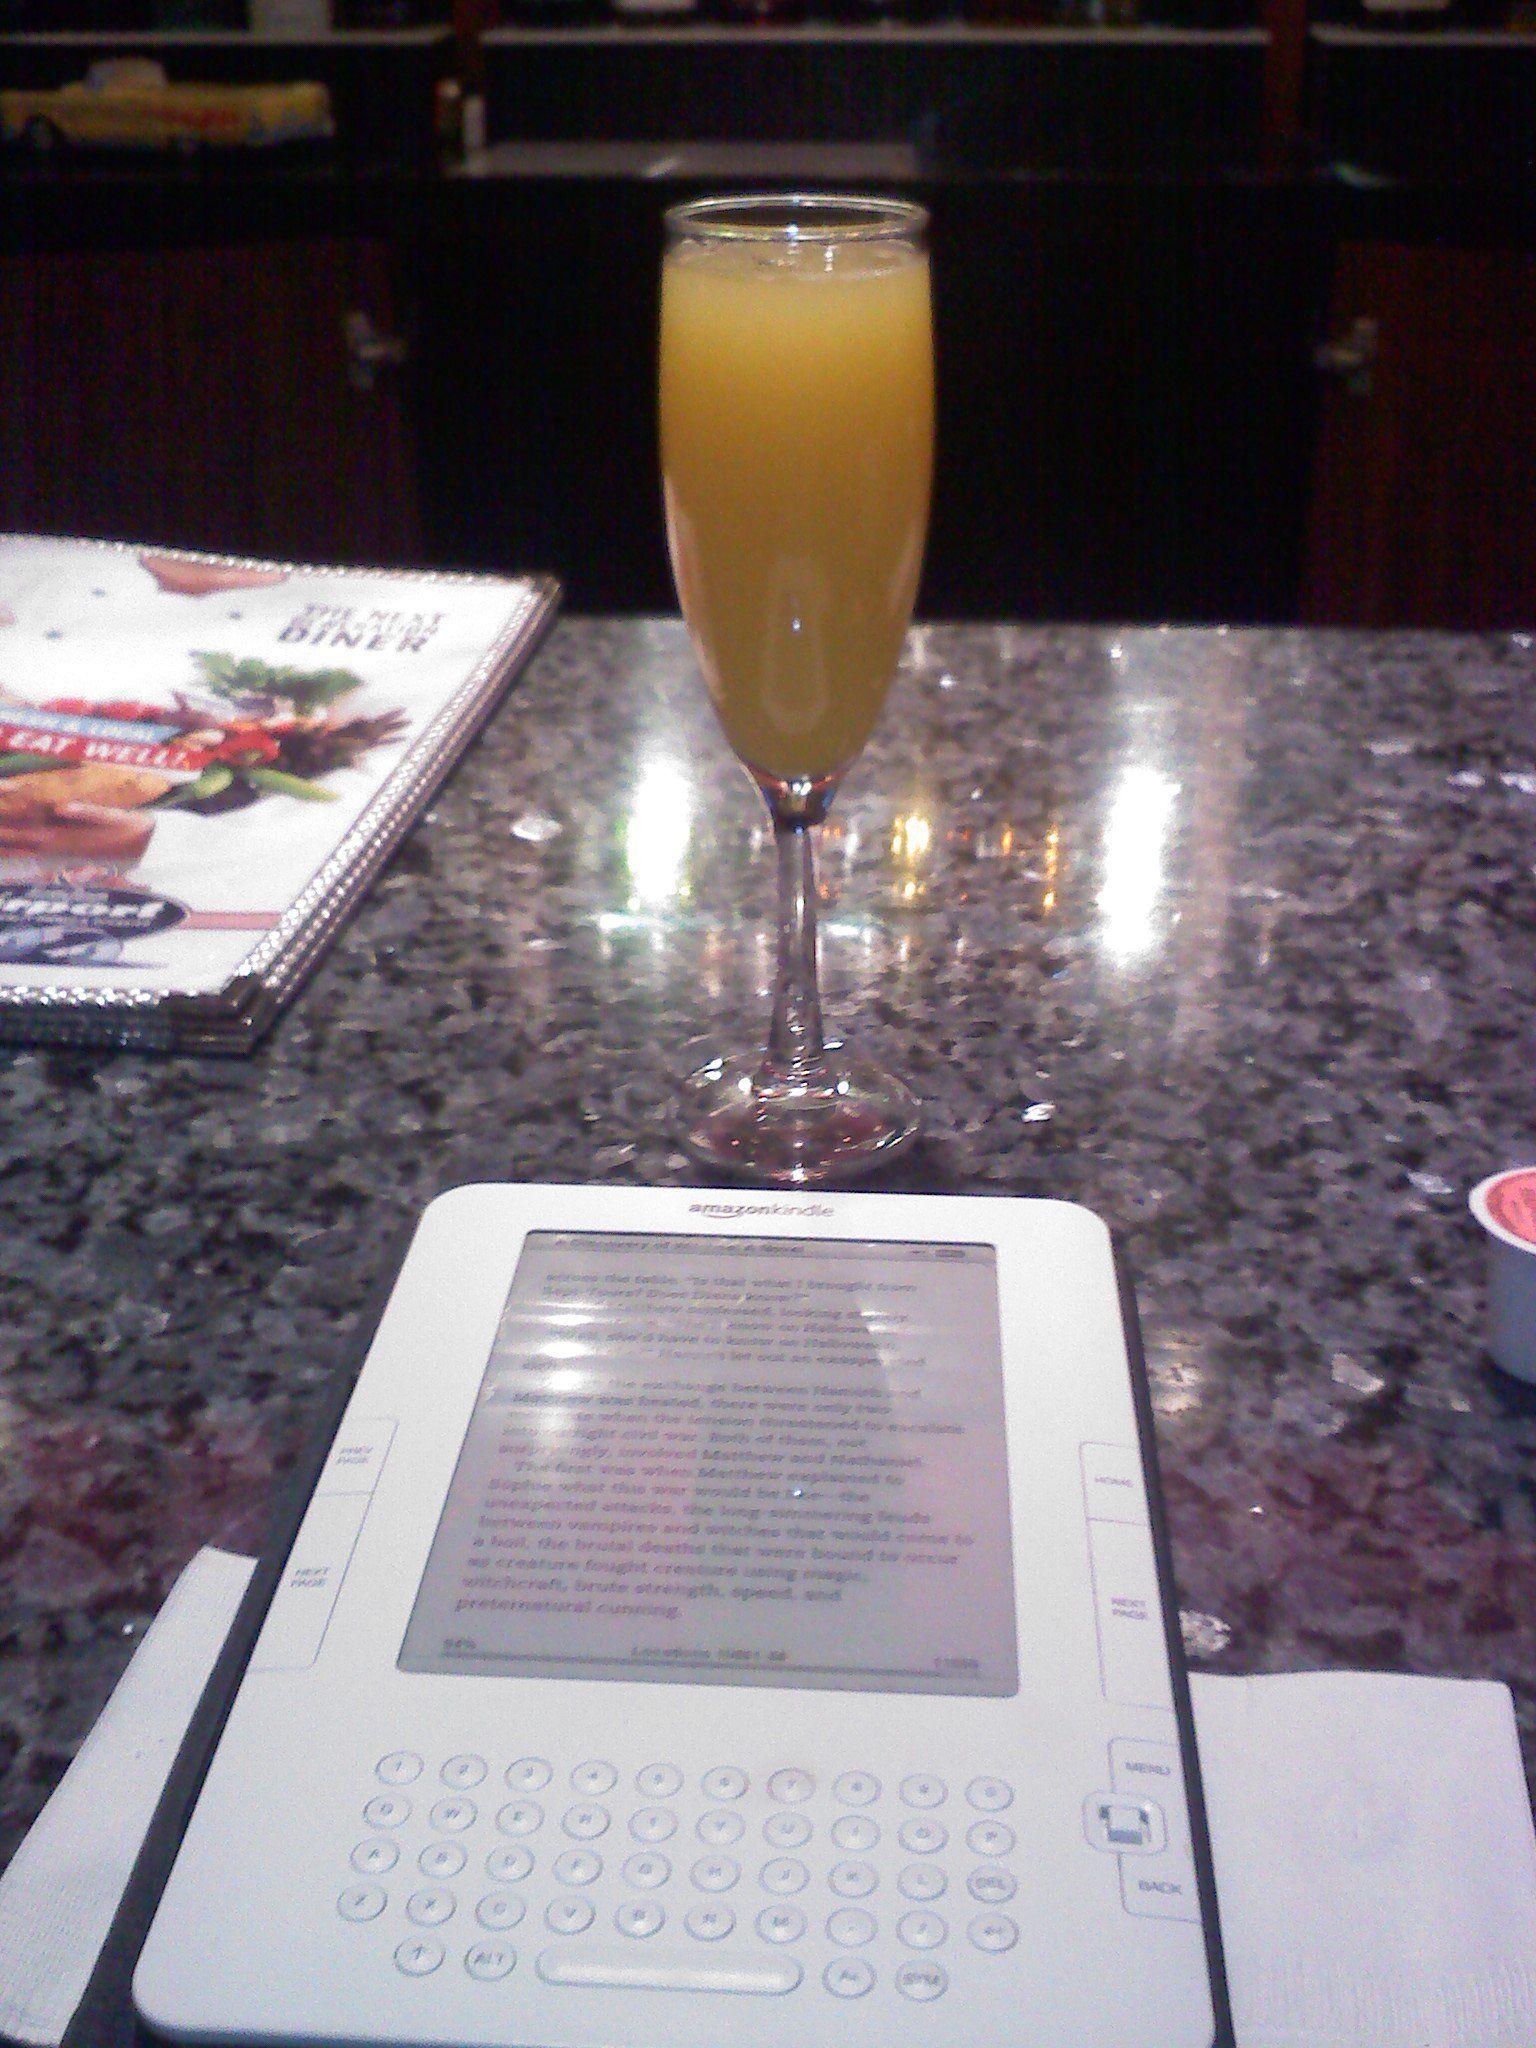 Mimosa and Kindle